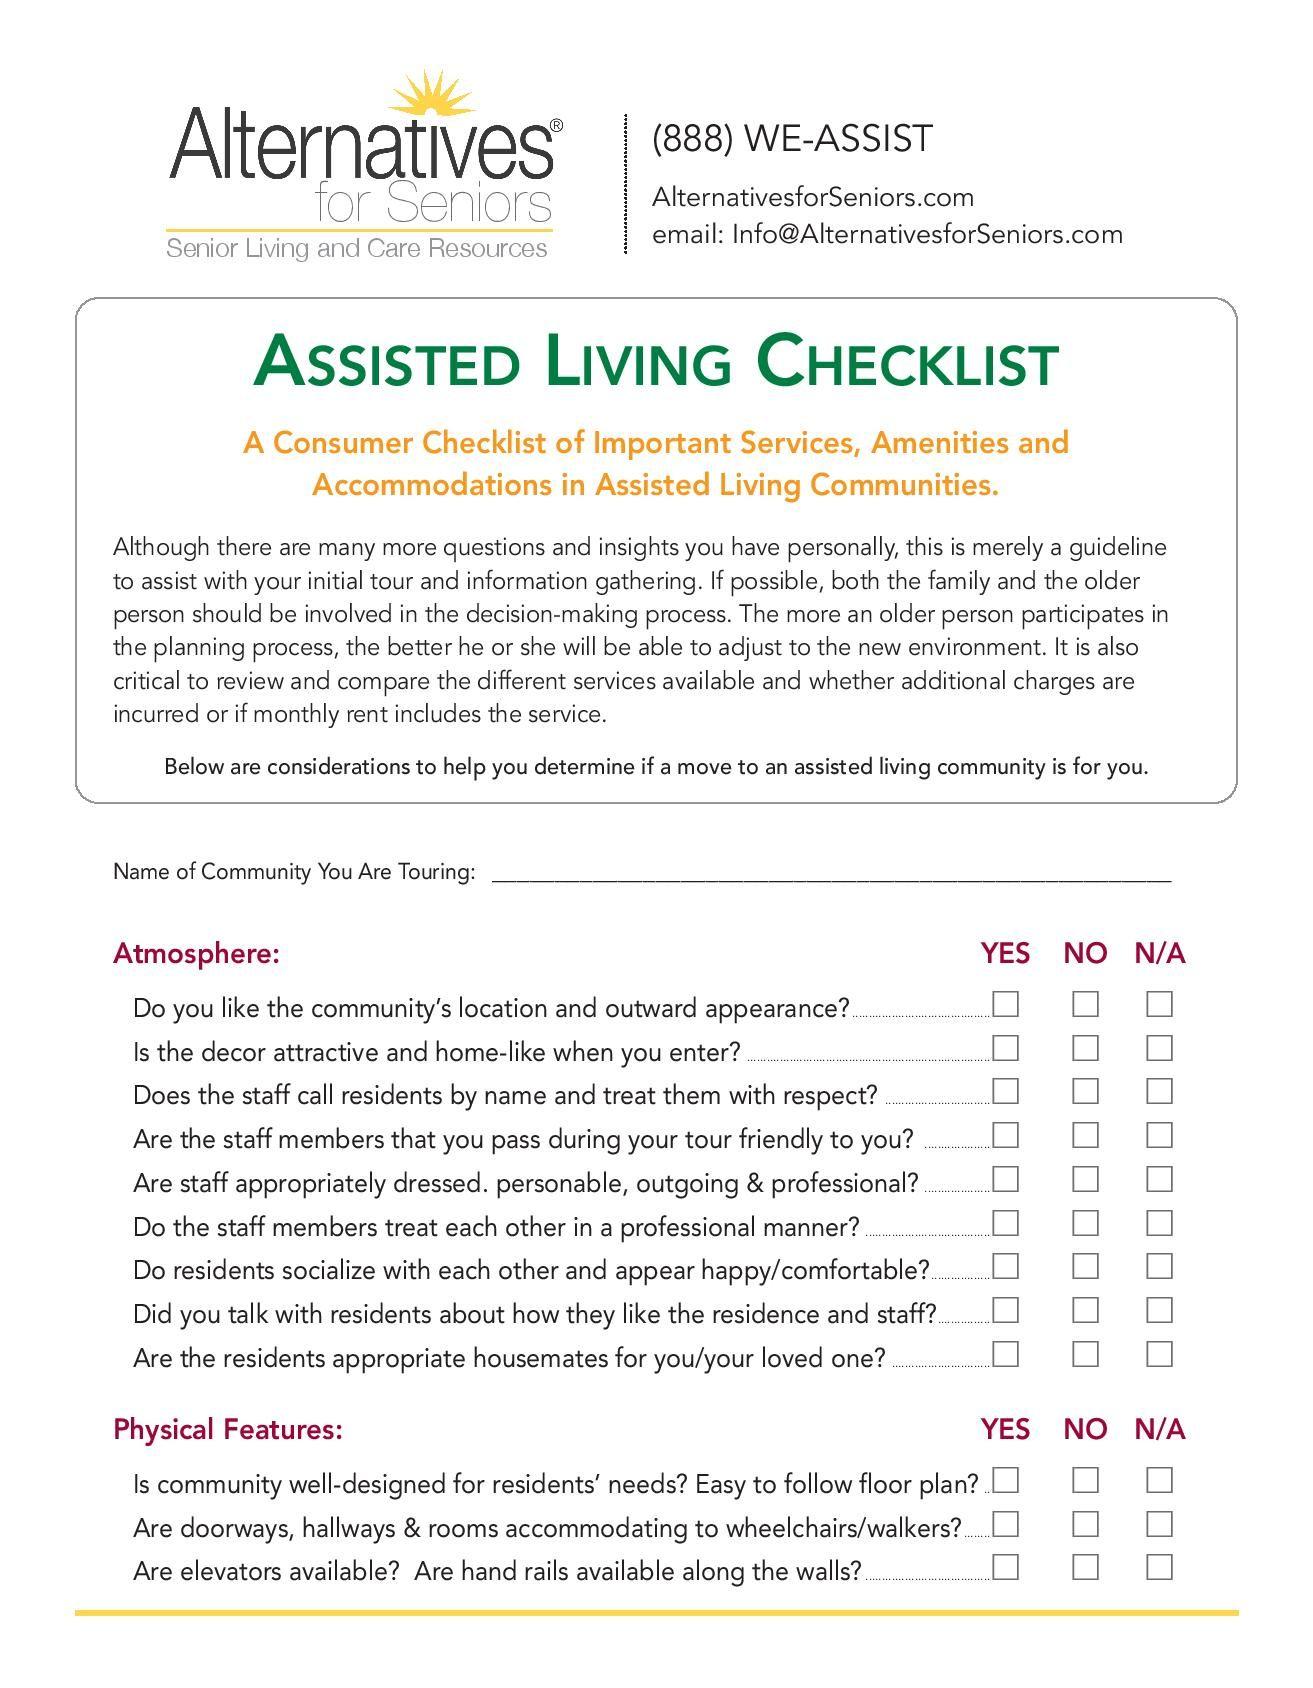 Assisted Living Checklist Alternatives For Seniors